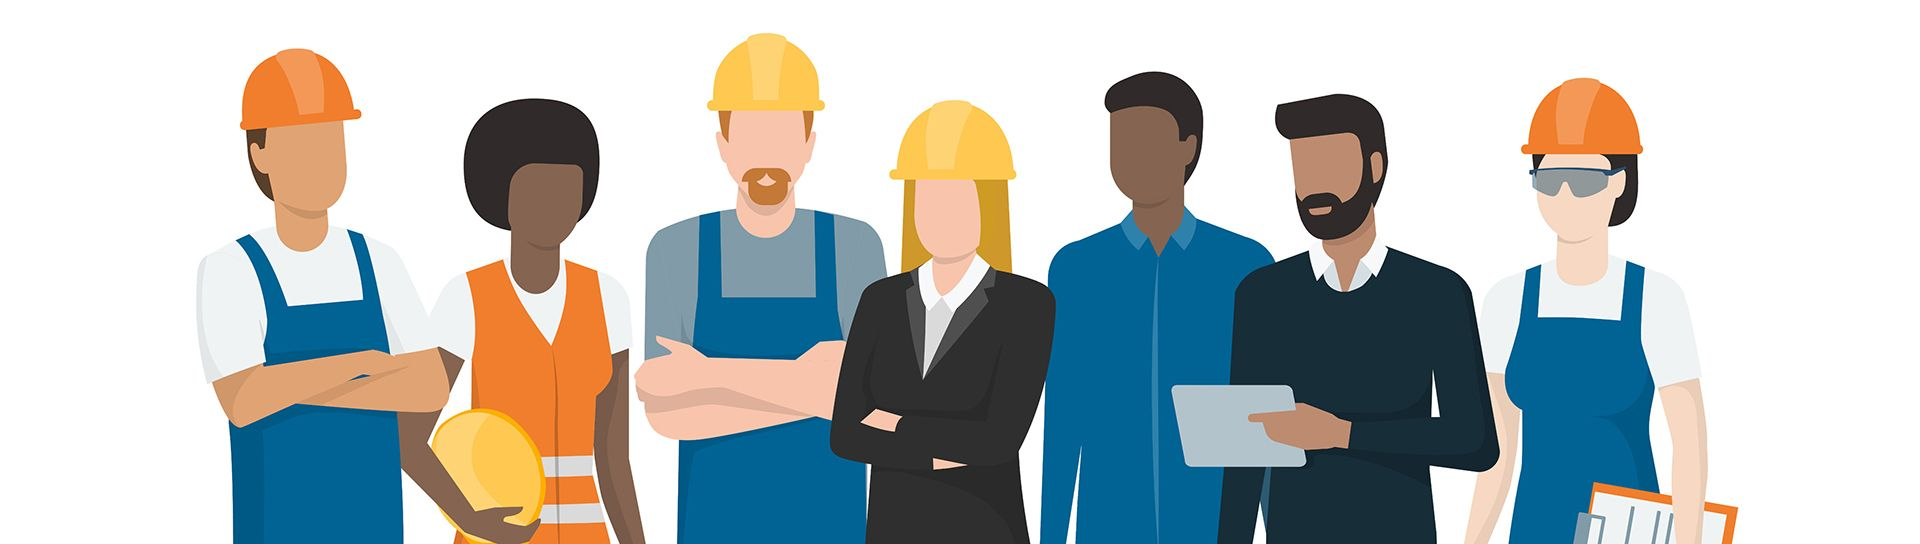 Smart workforce company